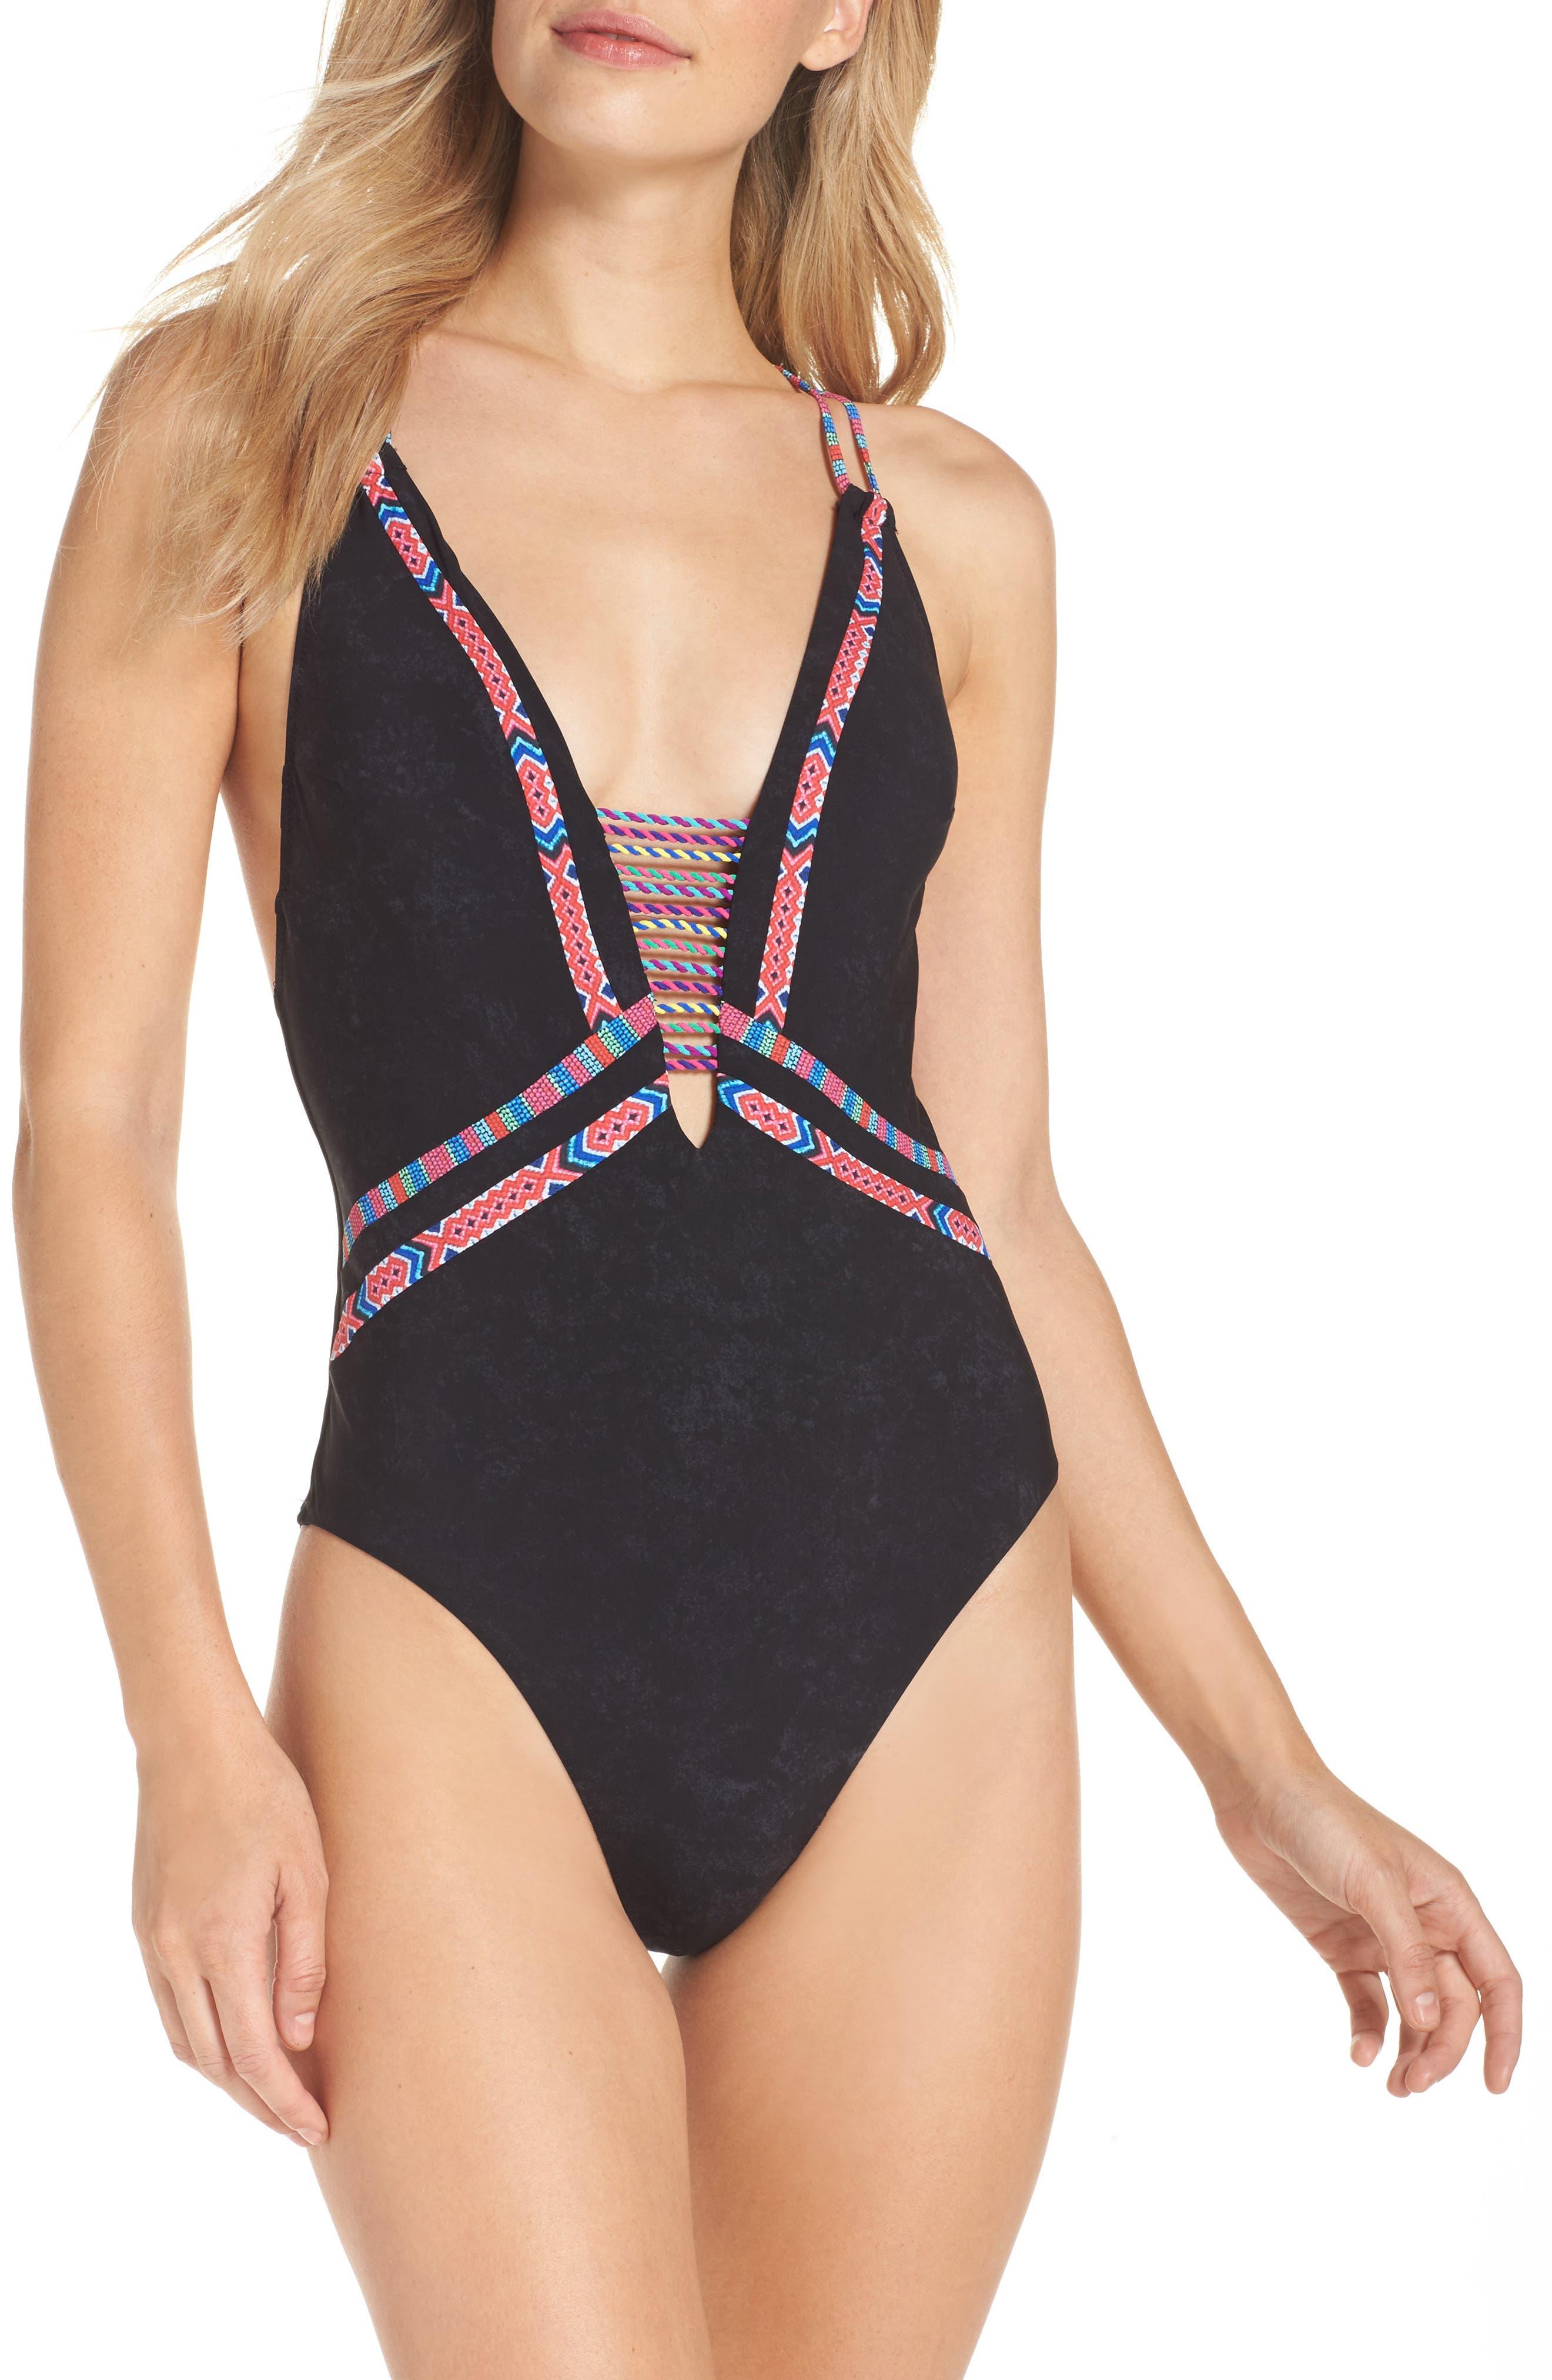 Cha Cha Cha Goddess One-Piece Swimsuit,                         Main,                         color, 001